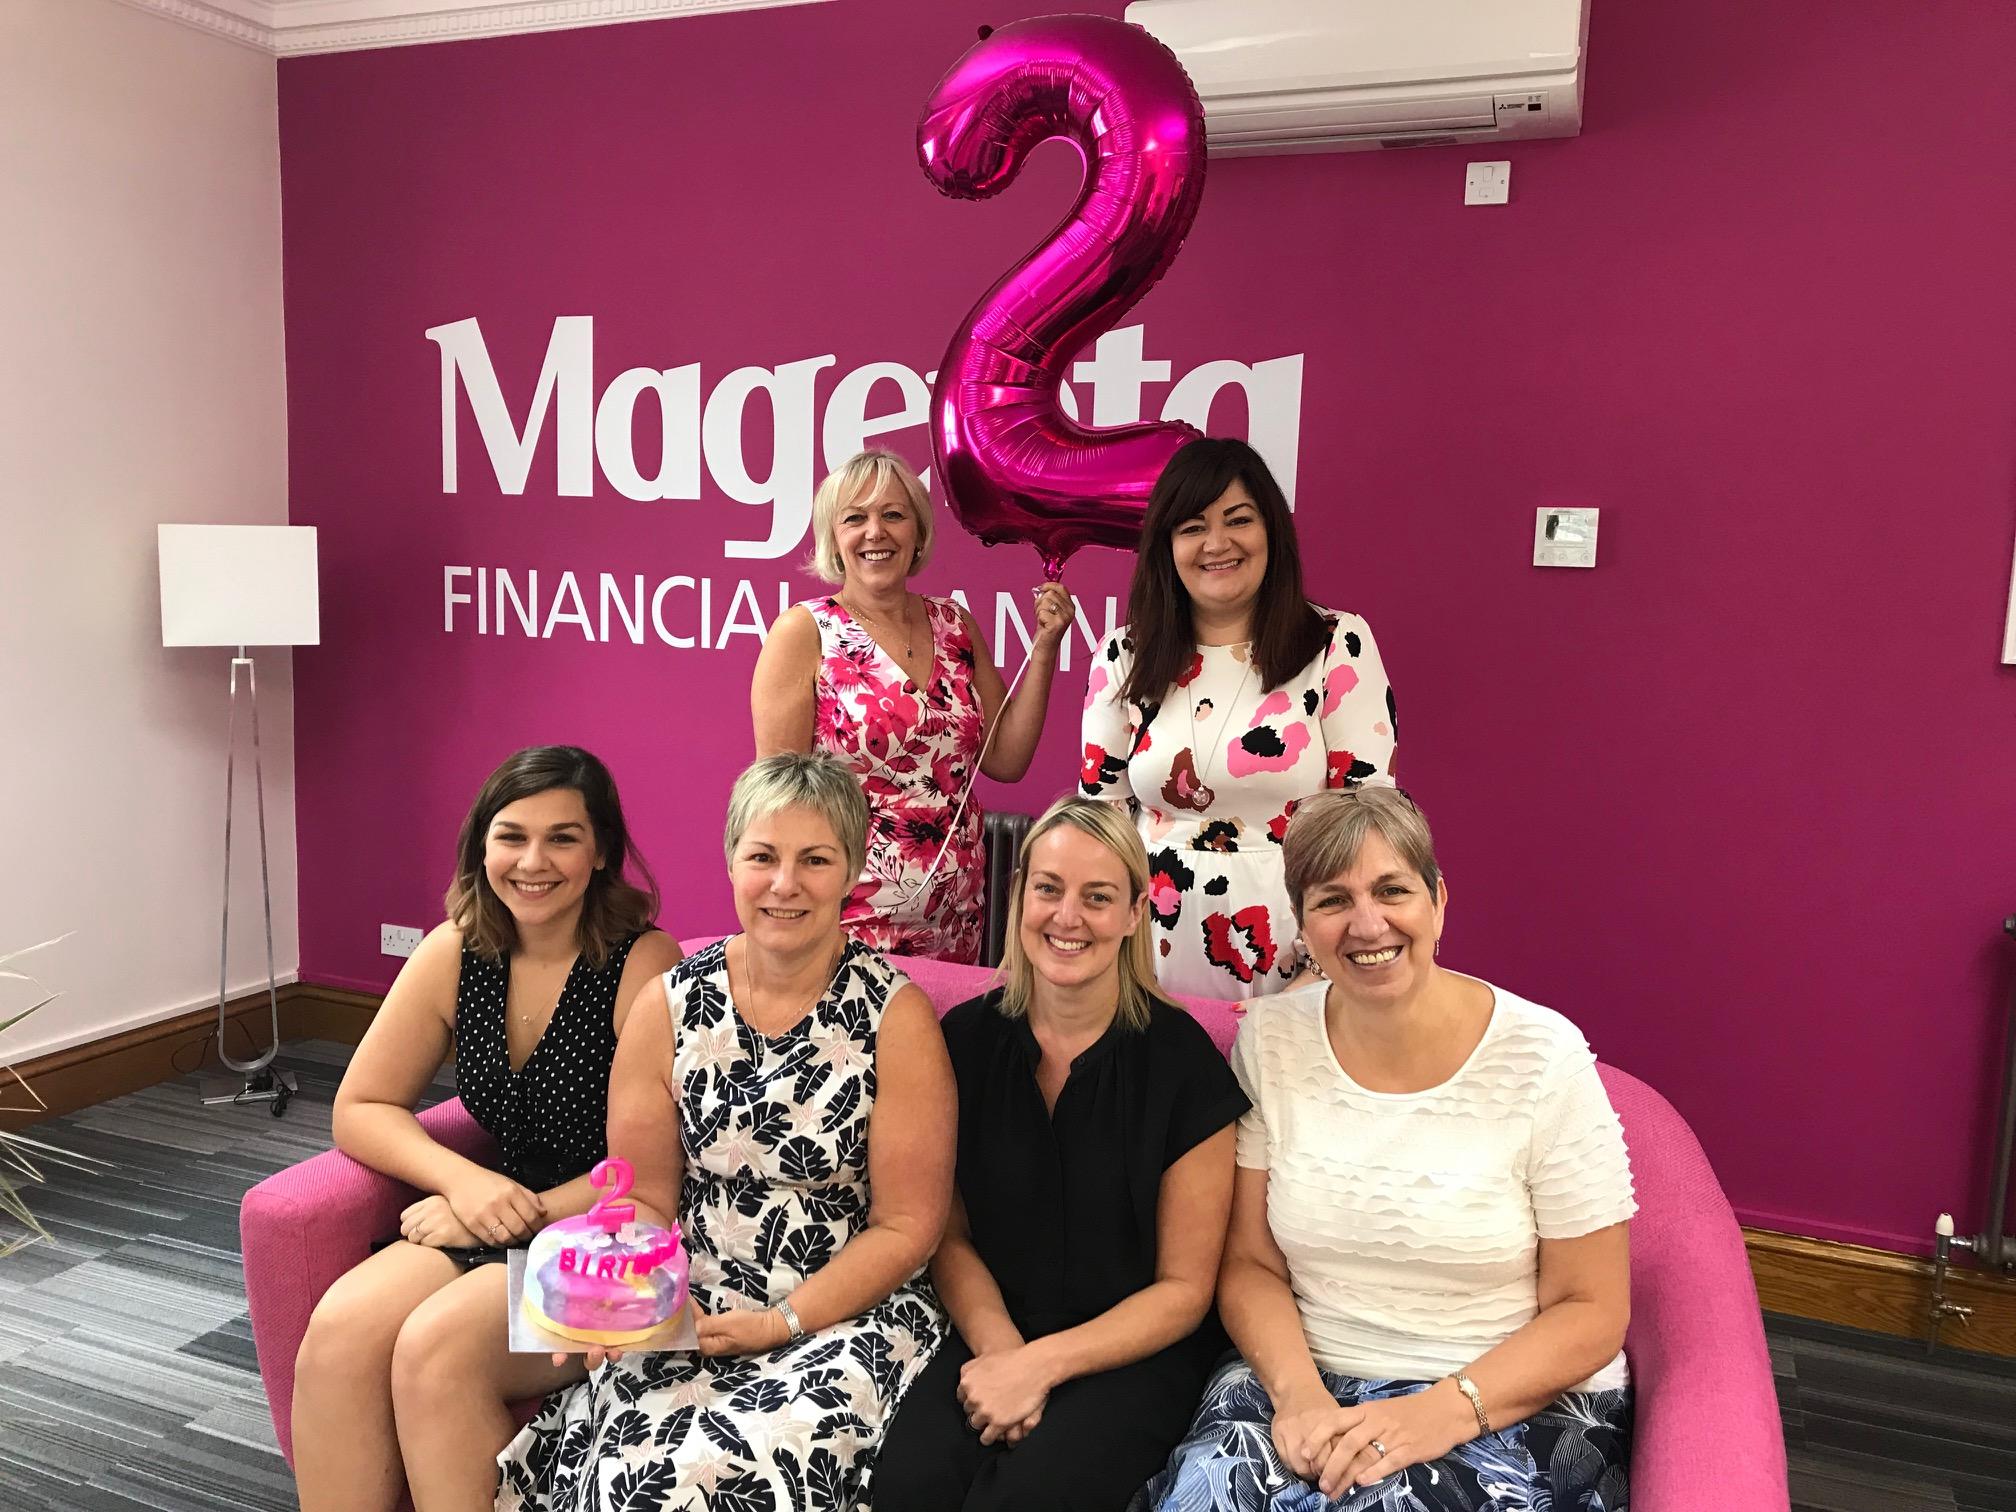 Magenta's Birthday, Magenta Financial Planning, Bridgend, South Wales, financial advice